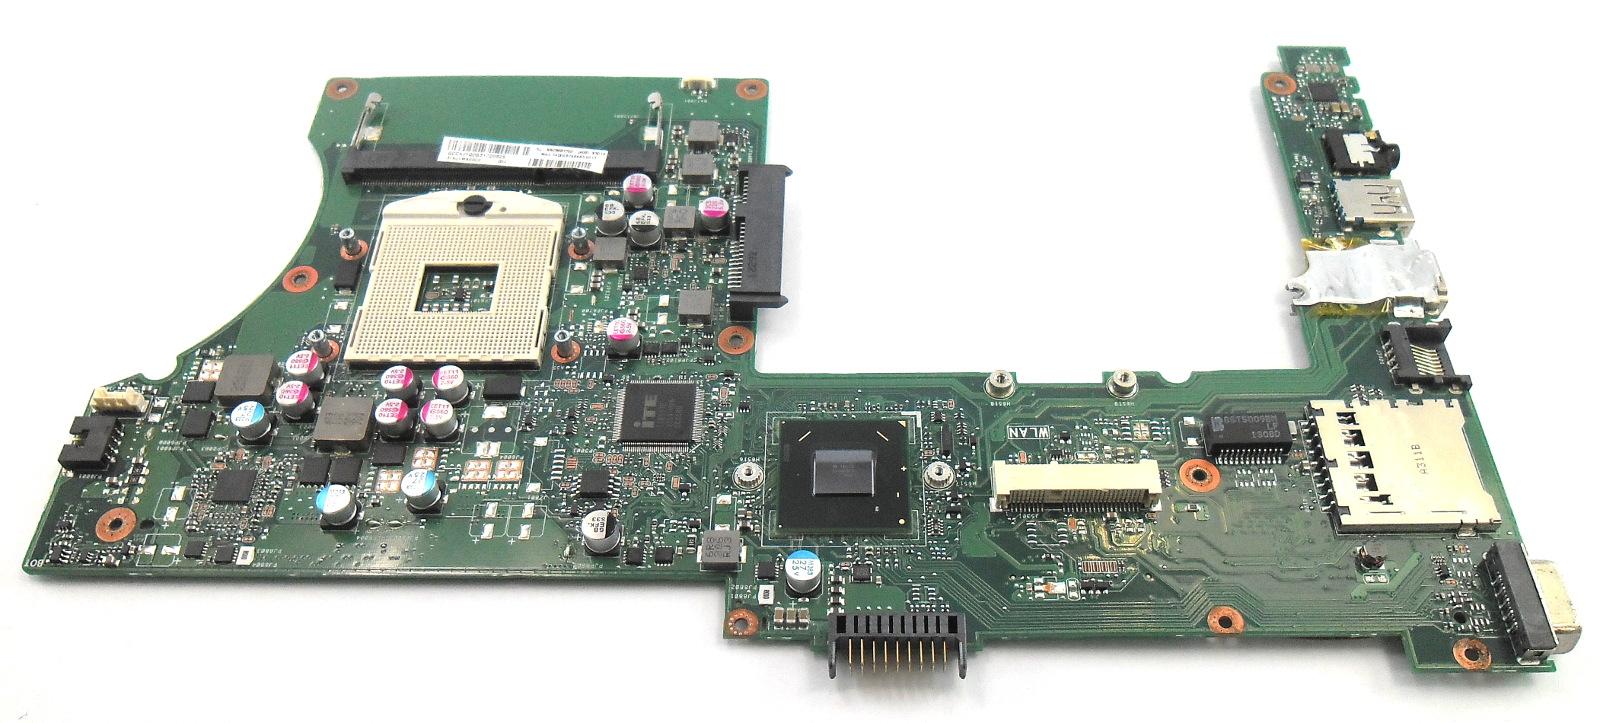 60-NNOMB1102-A06 Asus X501A Socket rPGA-989 Laptop Motherboard